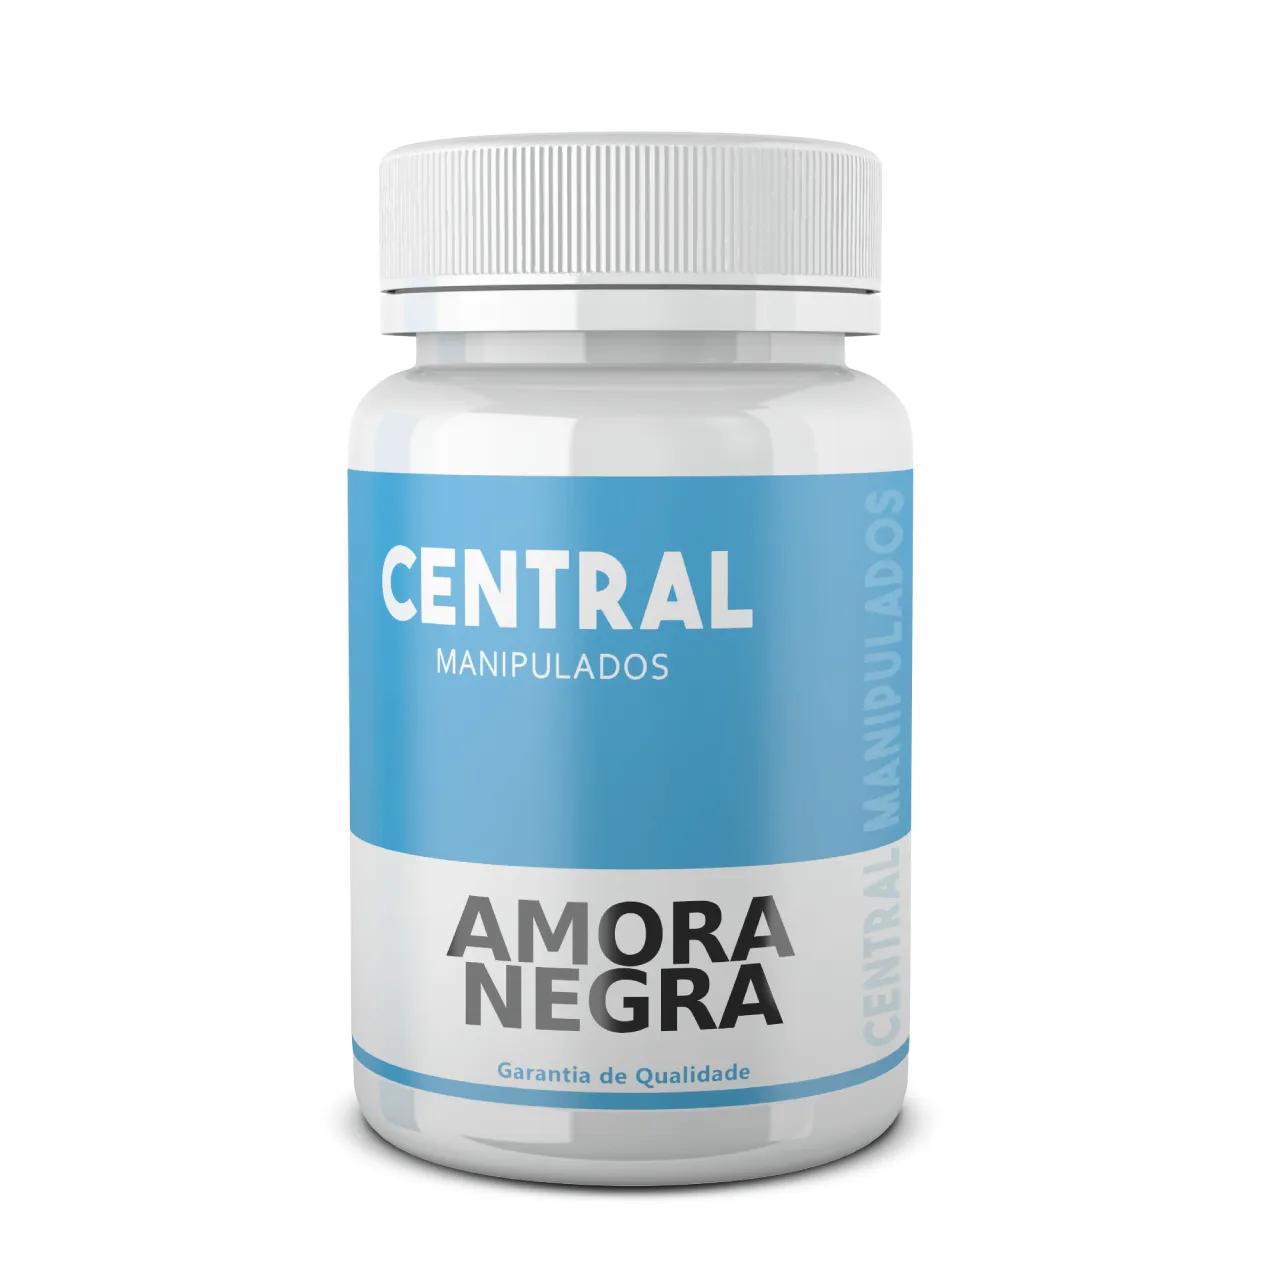 Amora Negra 500mg - 60 cápsulas - Antioxidante, Antiinflamatório, Diurético